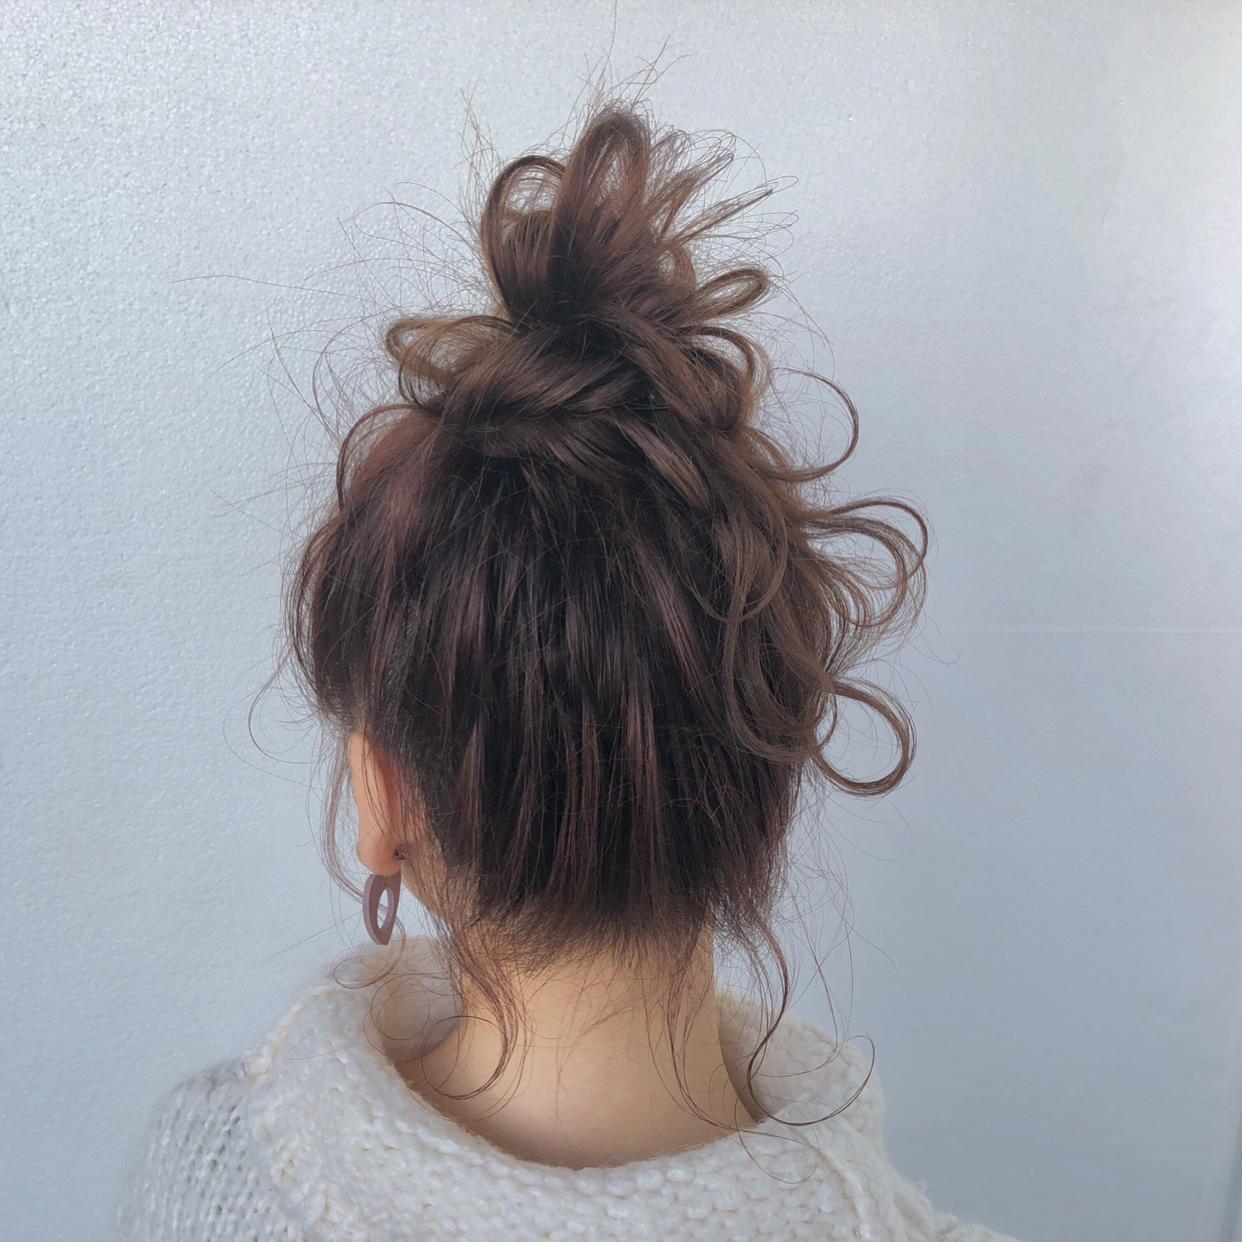 kawamura_takashi_cam ヘアアレンジ&ヘアセット 河村タカシ めちゃ簡単逆リンパお団子ヘア #hairarrangecam #hairarrange #hairset #hair #ヘアアレンジ #へアセット #ヘア #関西 #大阪 #心斎橋 #hairdresser #美容師 #サロンモデル募集 #サロモ #おくれ毛 #簡単ヘアアレンジ